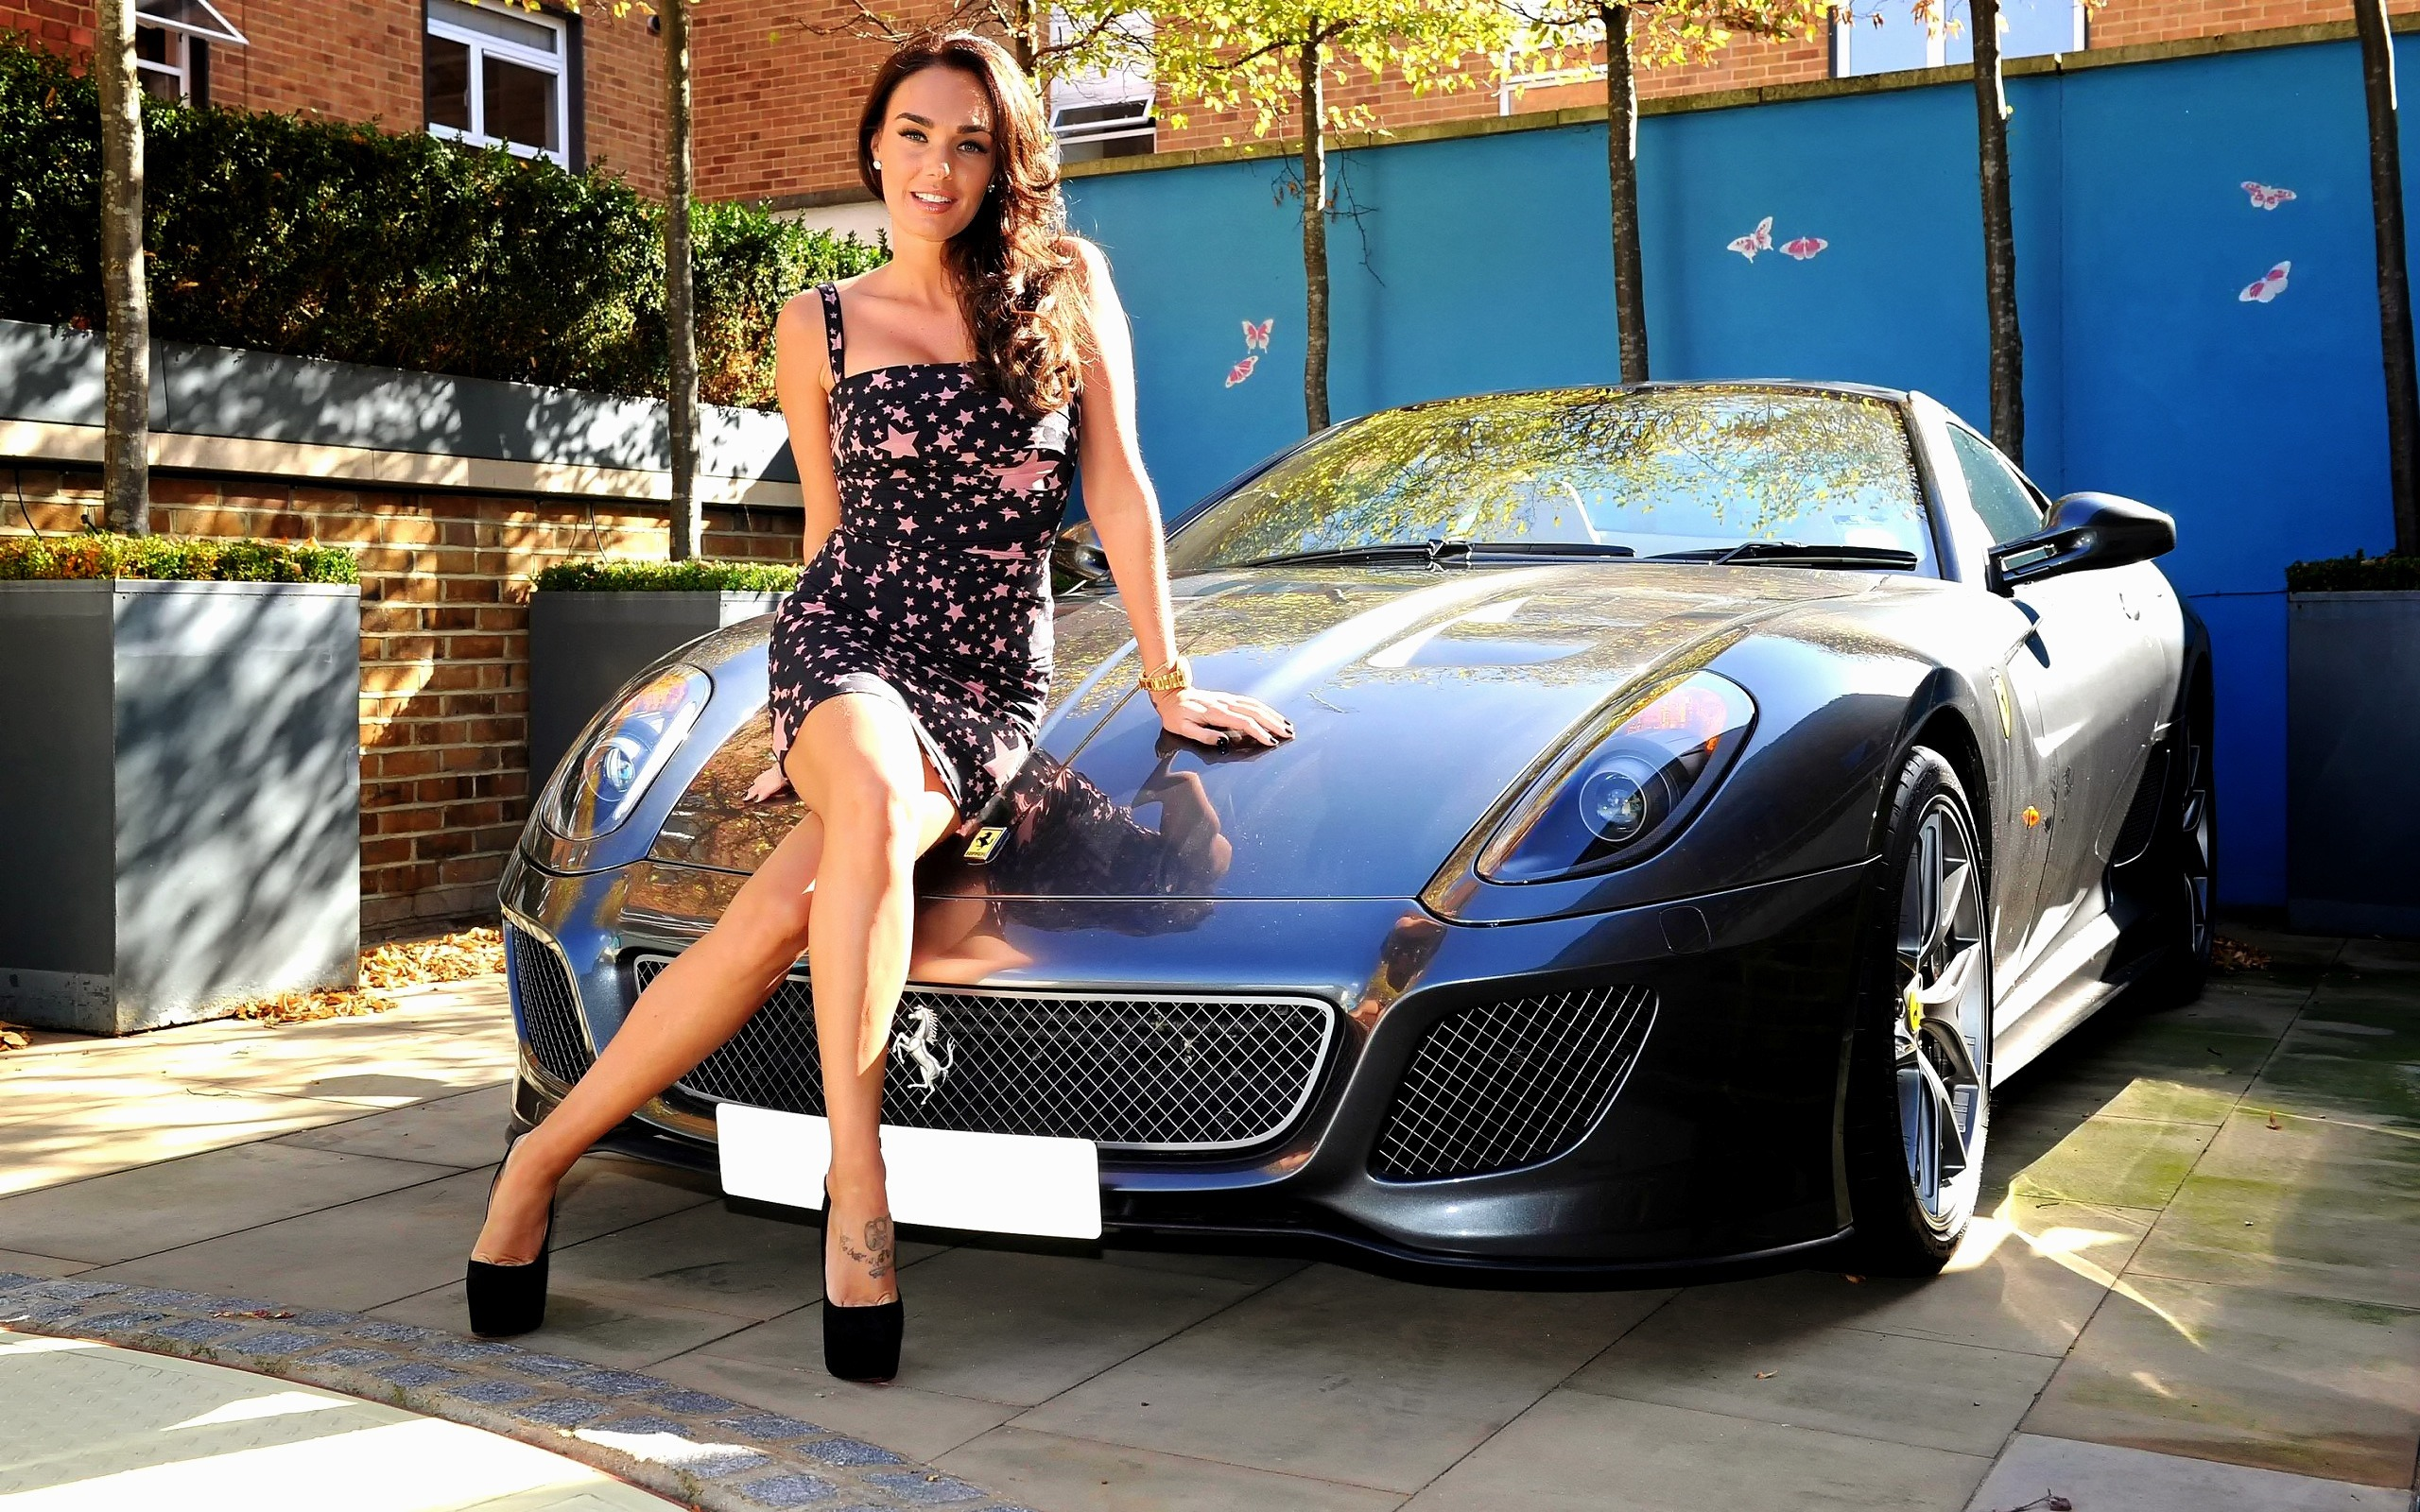 very-young-italian-car-models-girls-hot-muslim